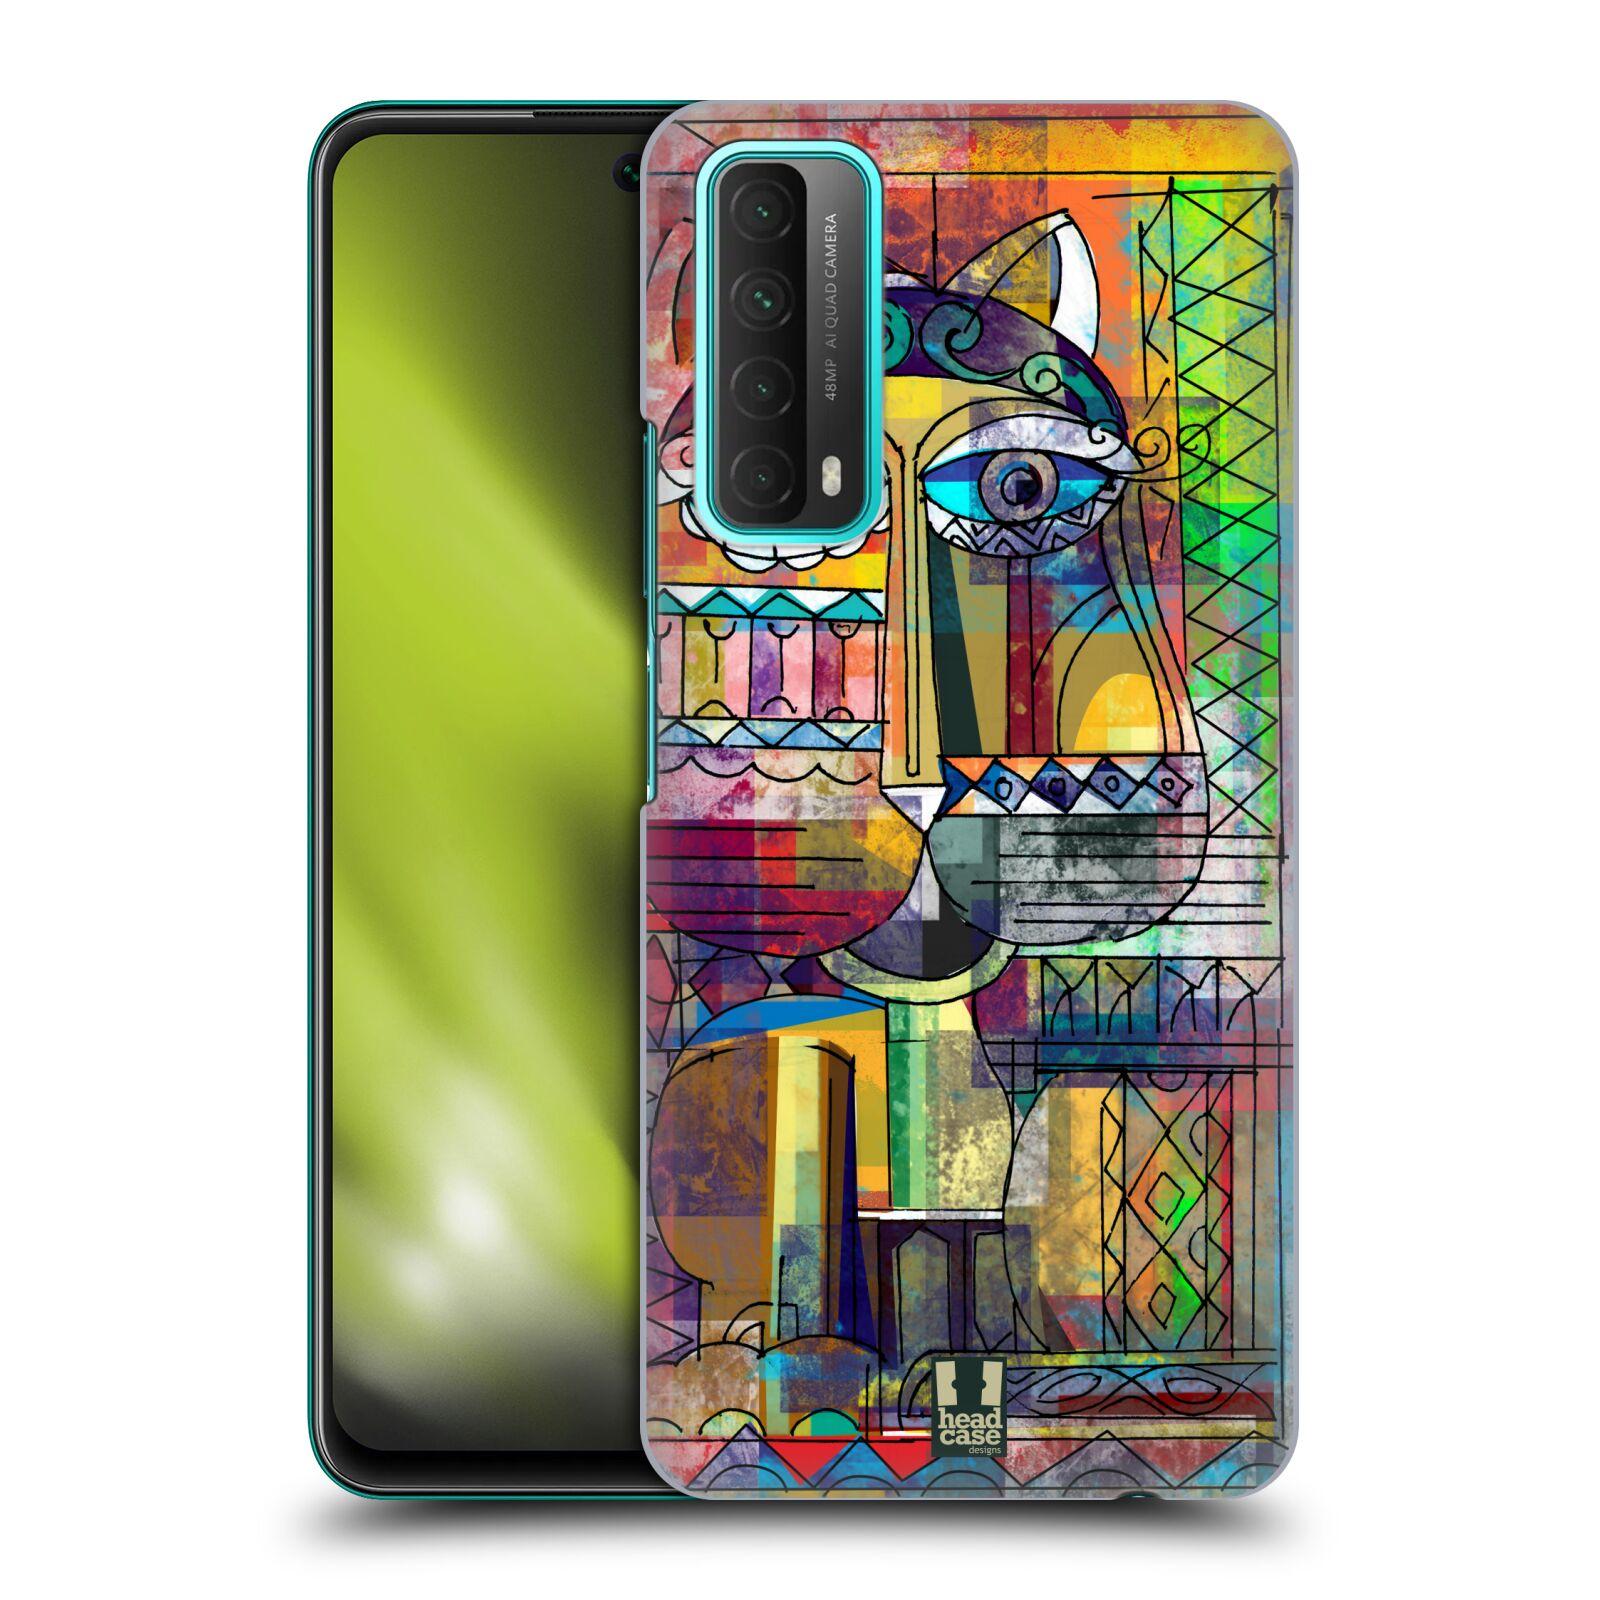 Plastové pouzdro na mobil Huawei P Smart (2021) - Head Case - AZTEC KORAT